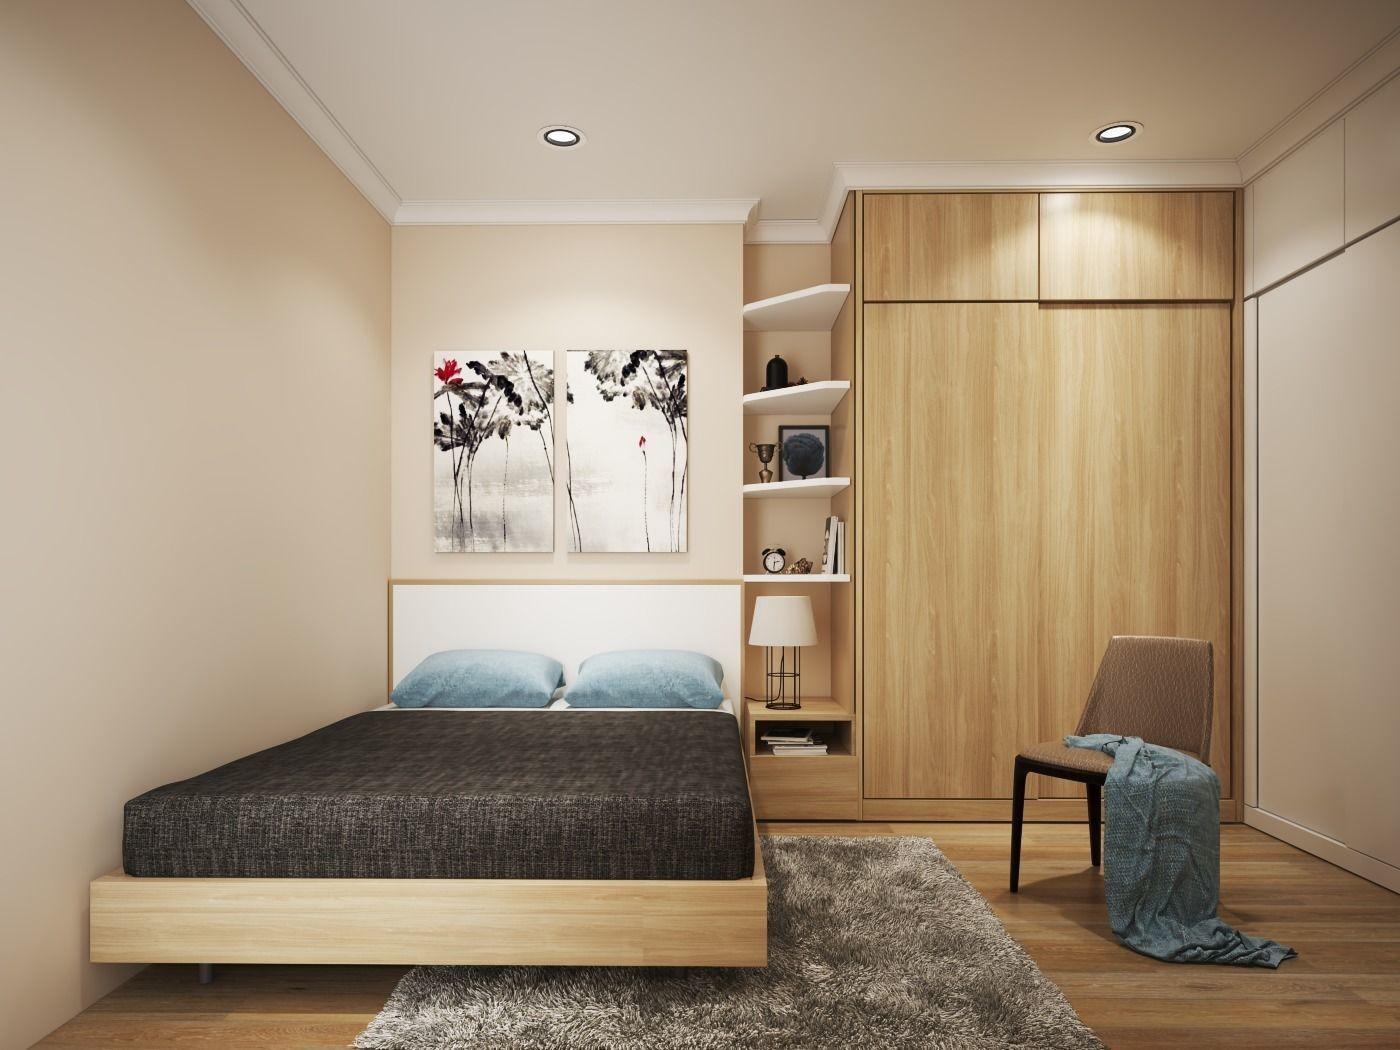 Simple Bedroom Model | Simple bedroom, Interior design ... on Model Bedroom Interior Design  id=73080